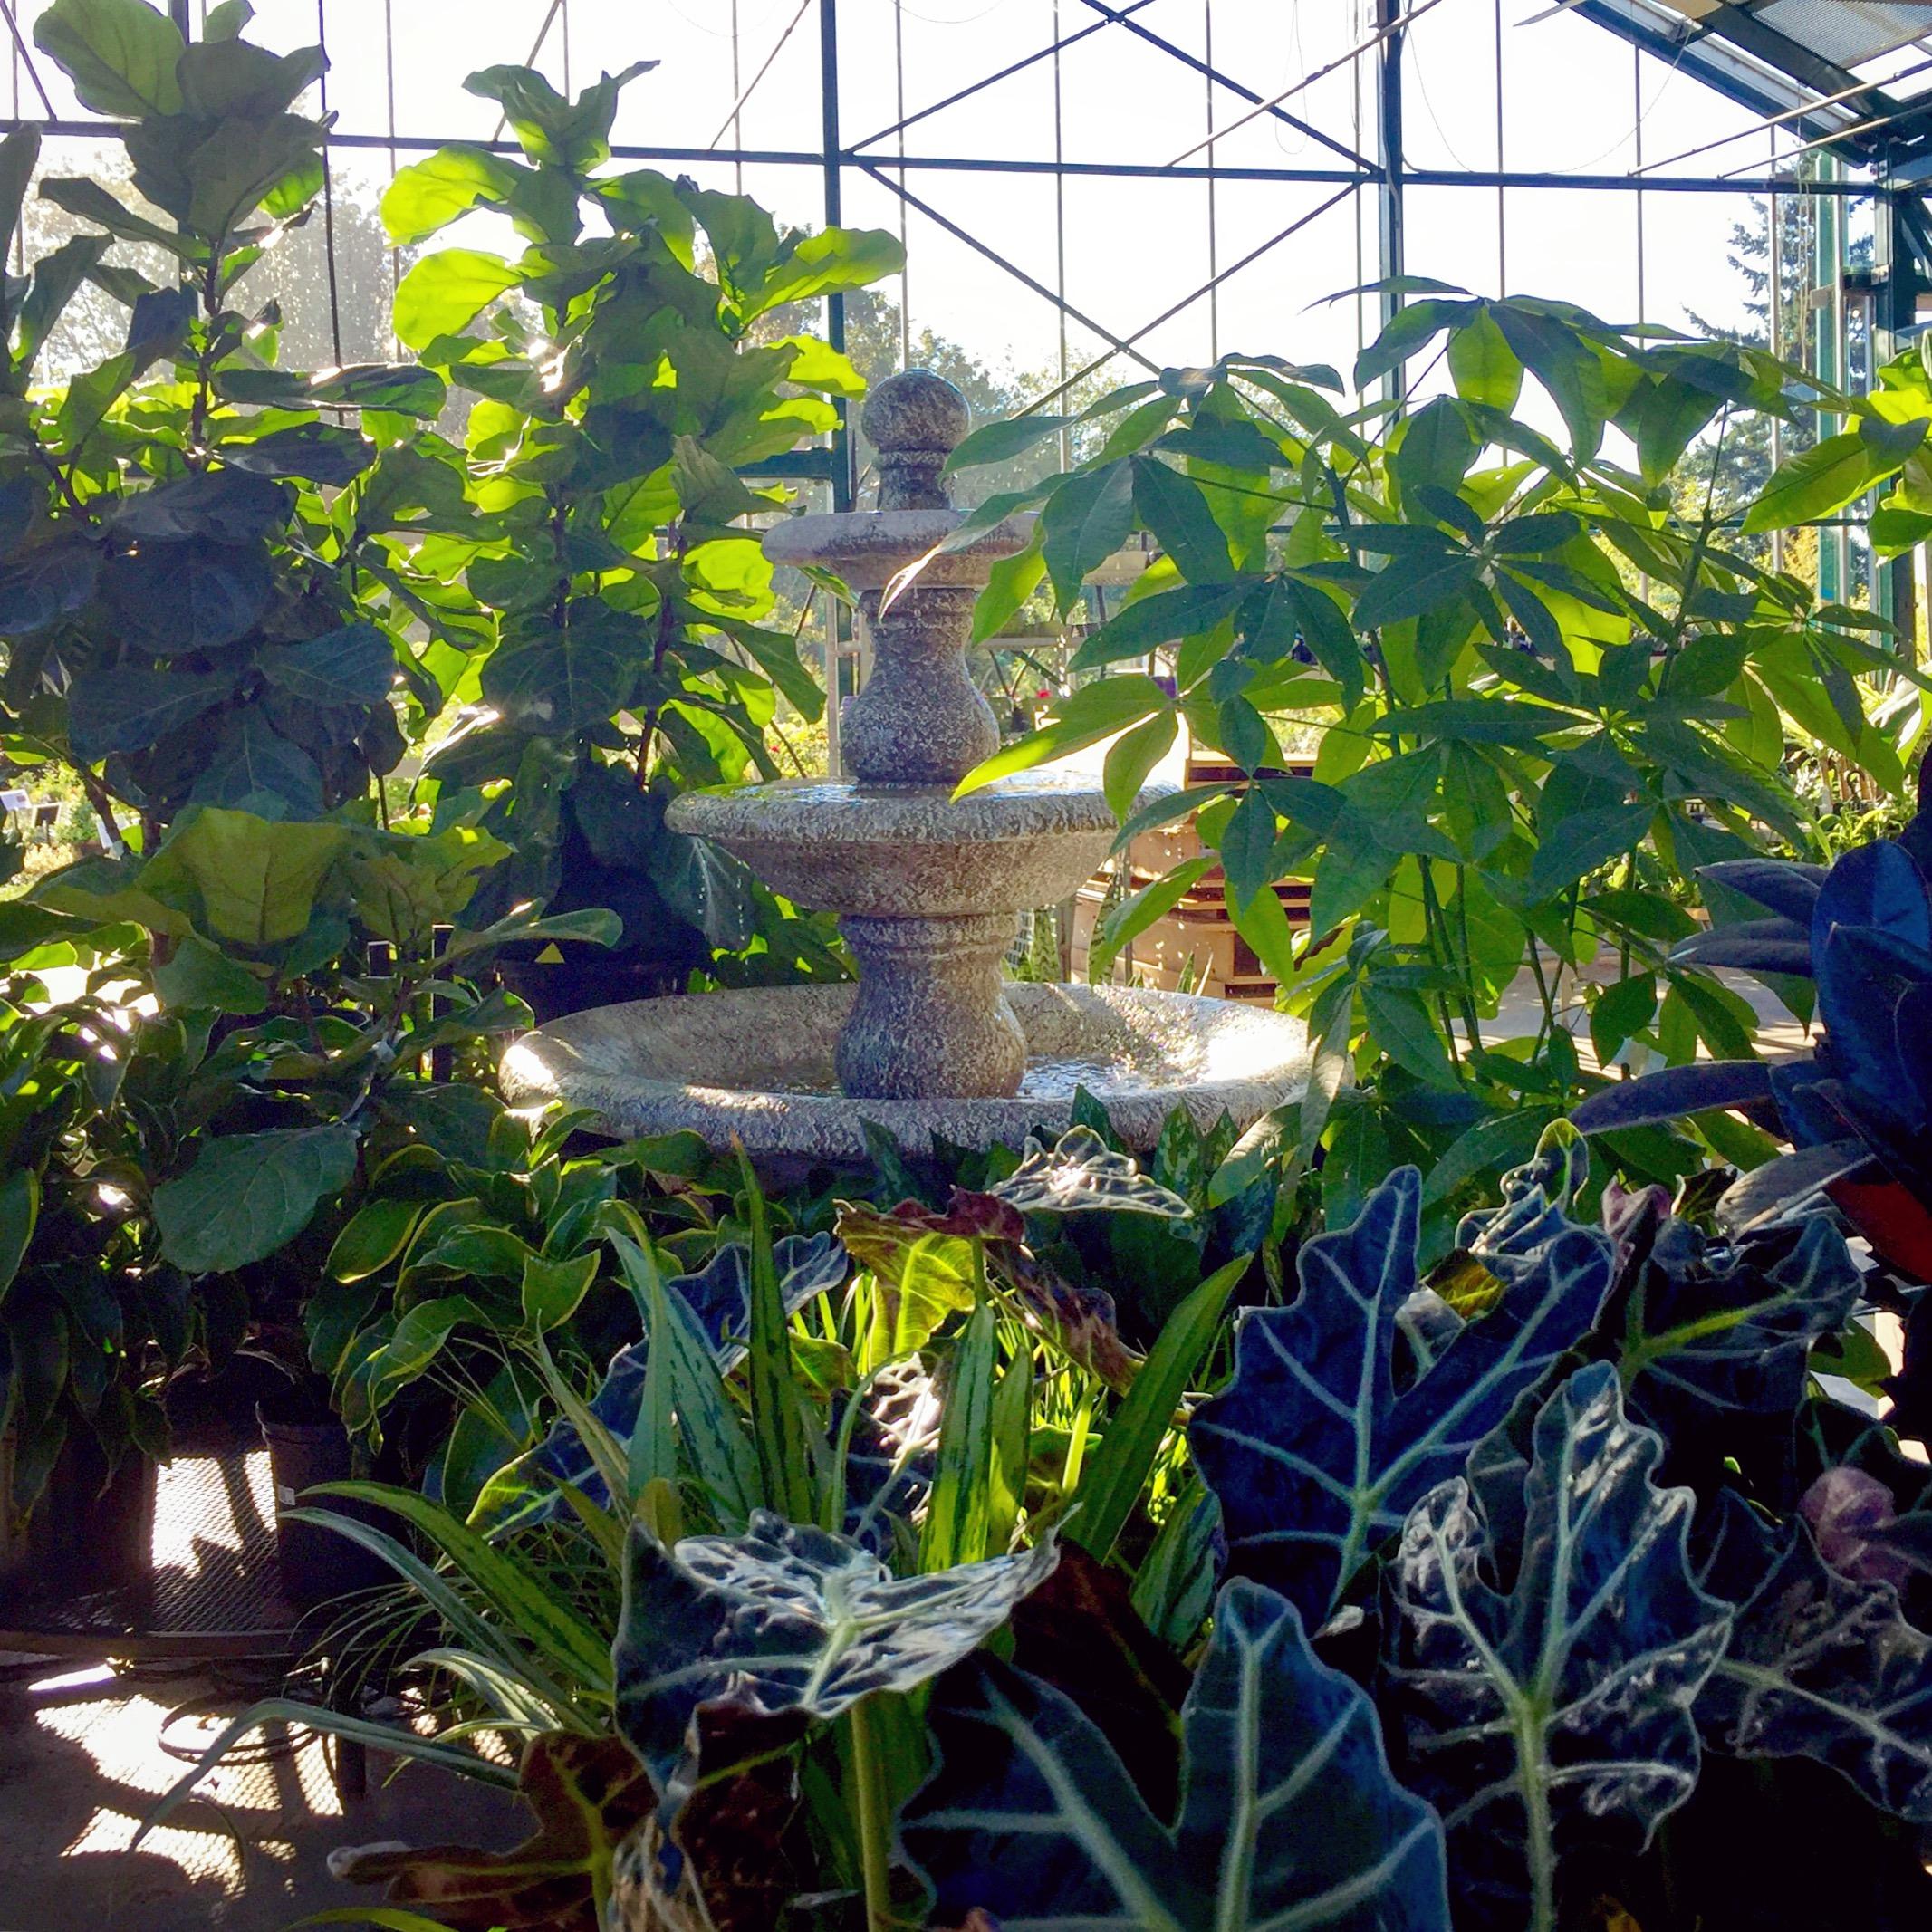 How Does Your Garden Grow? - Project Nursery